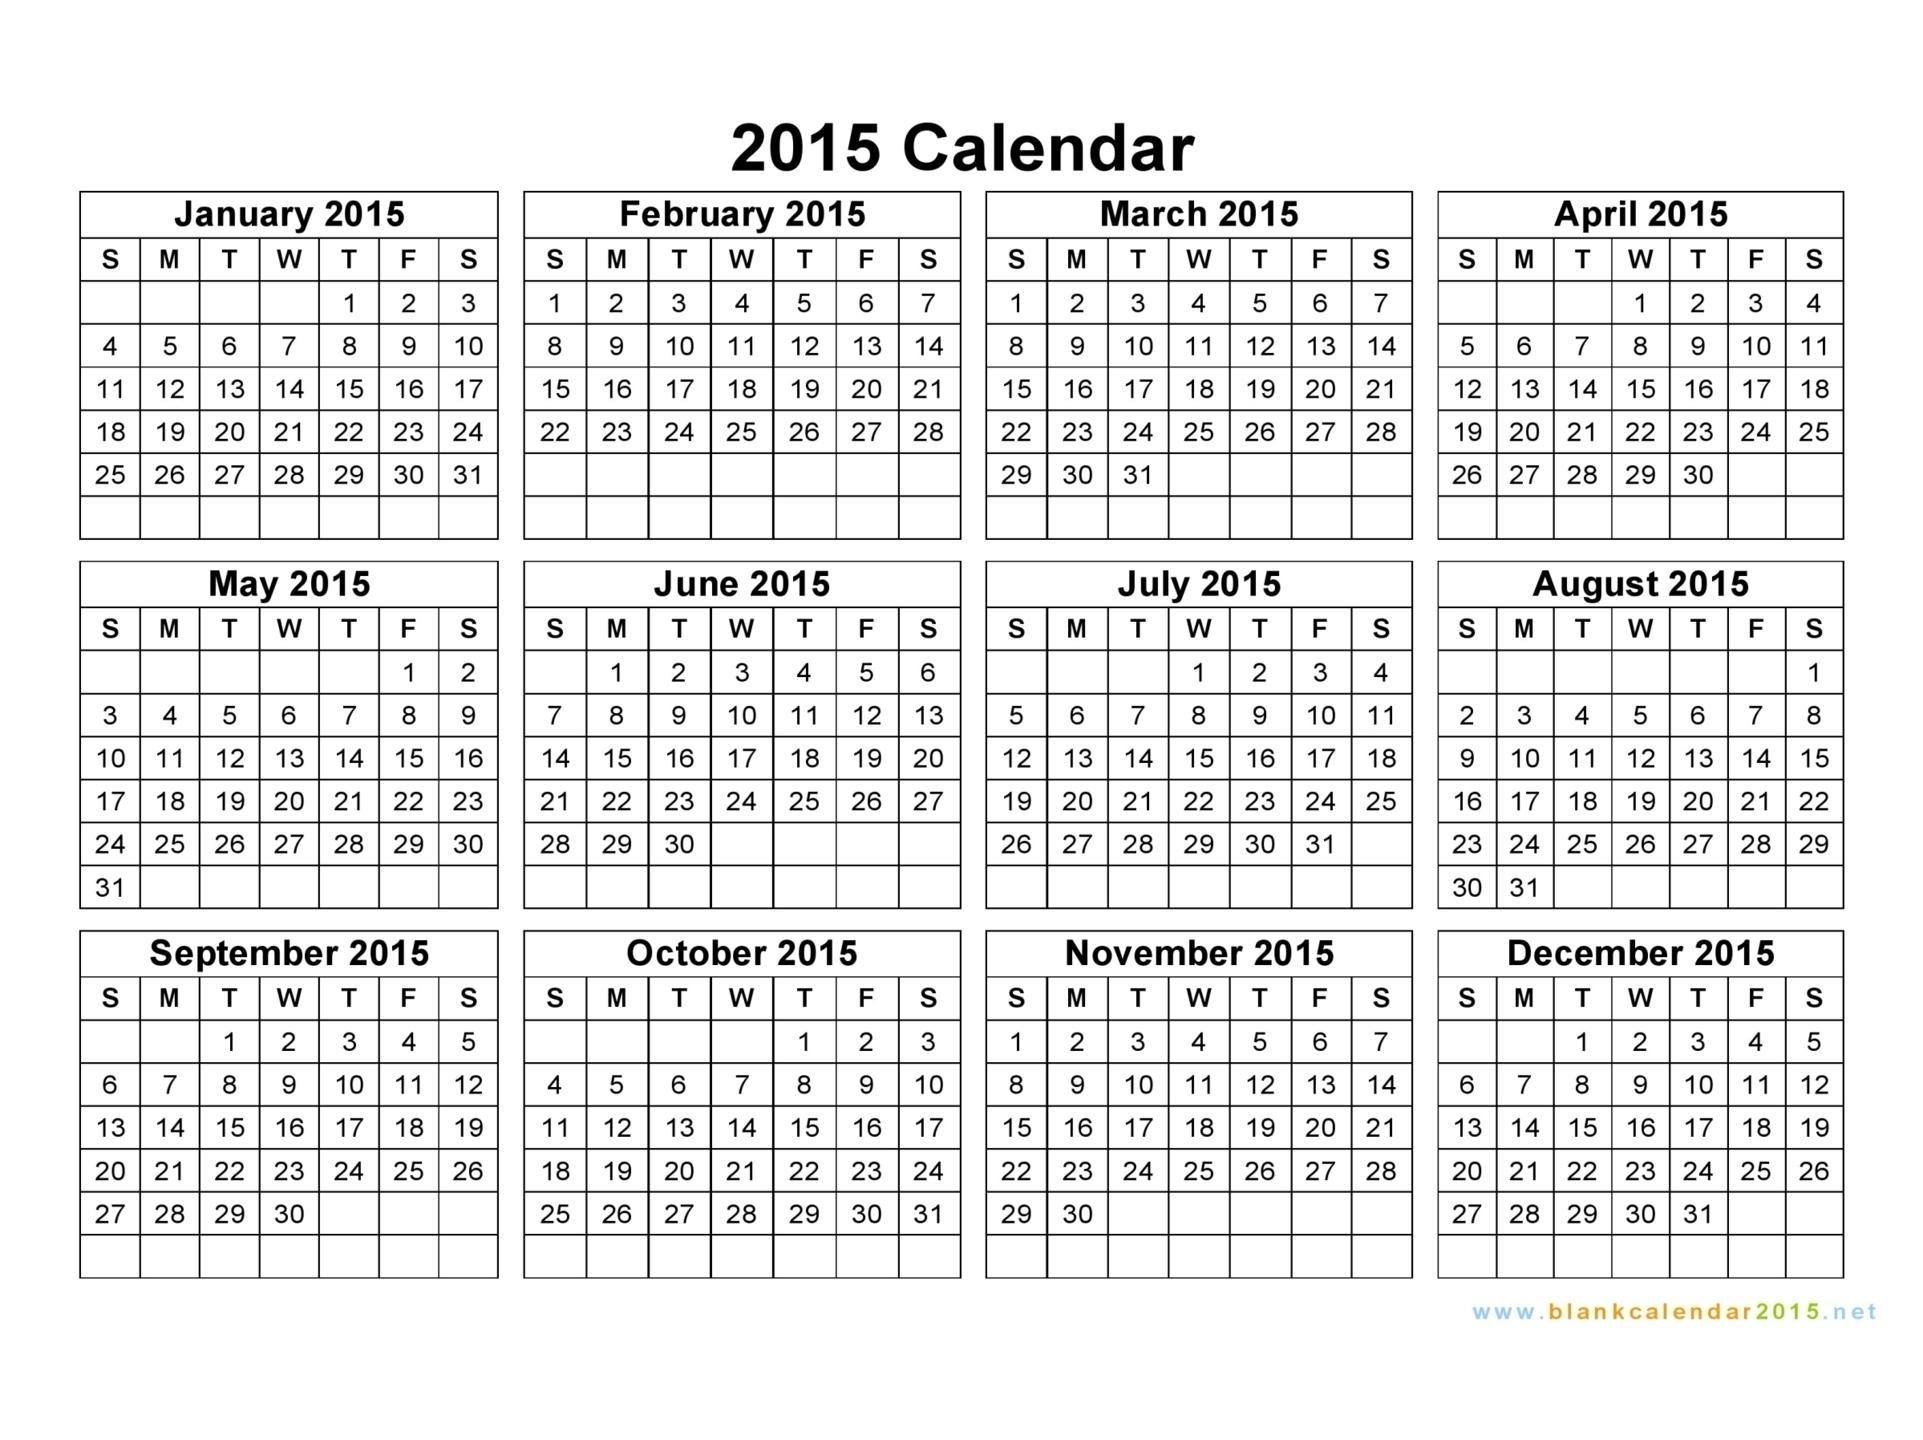 5 Year Calendar On One Page   Ten Free Printable Calendar 2020-2021